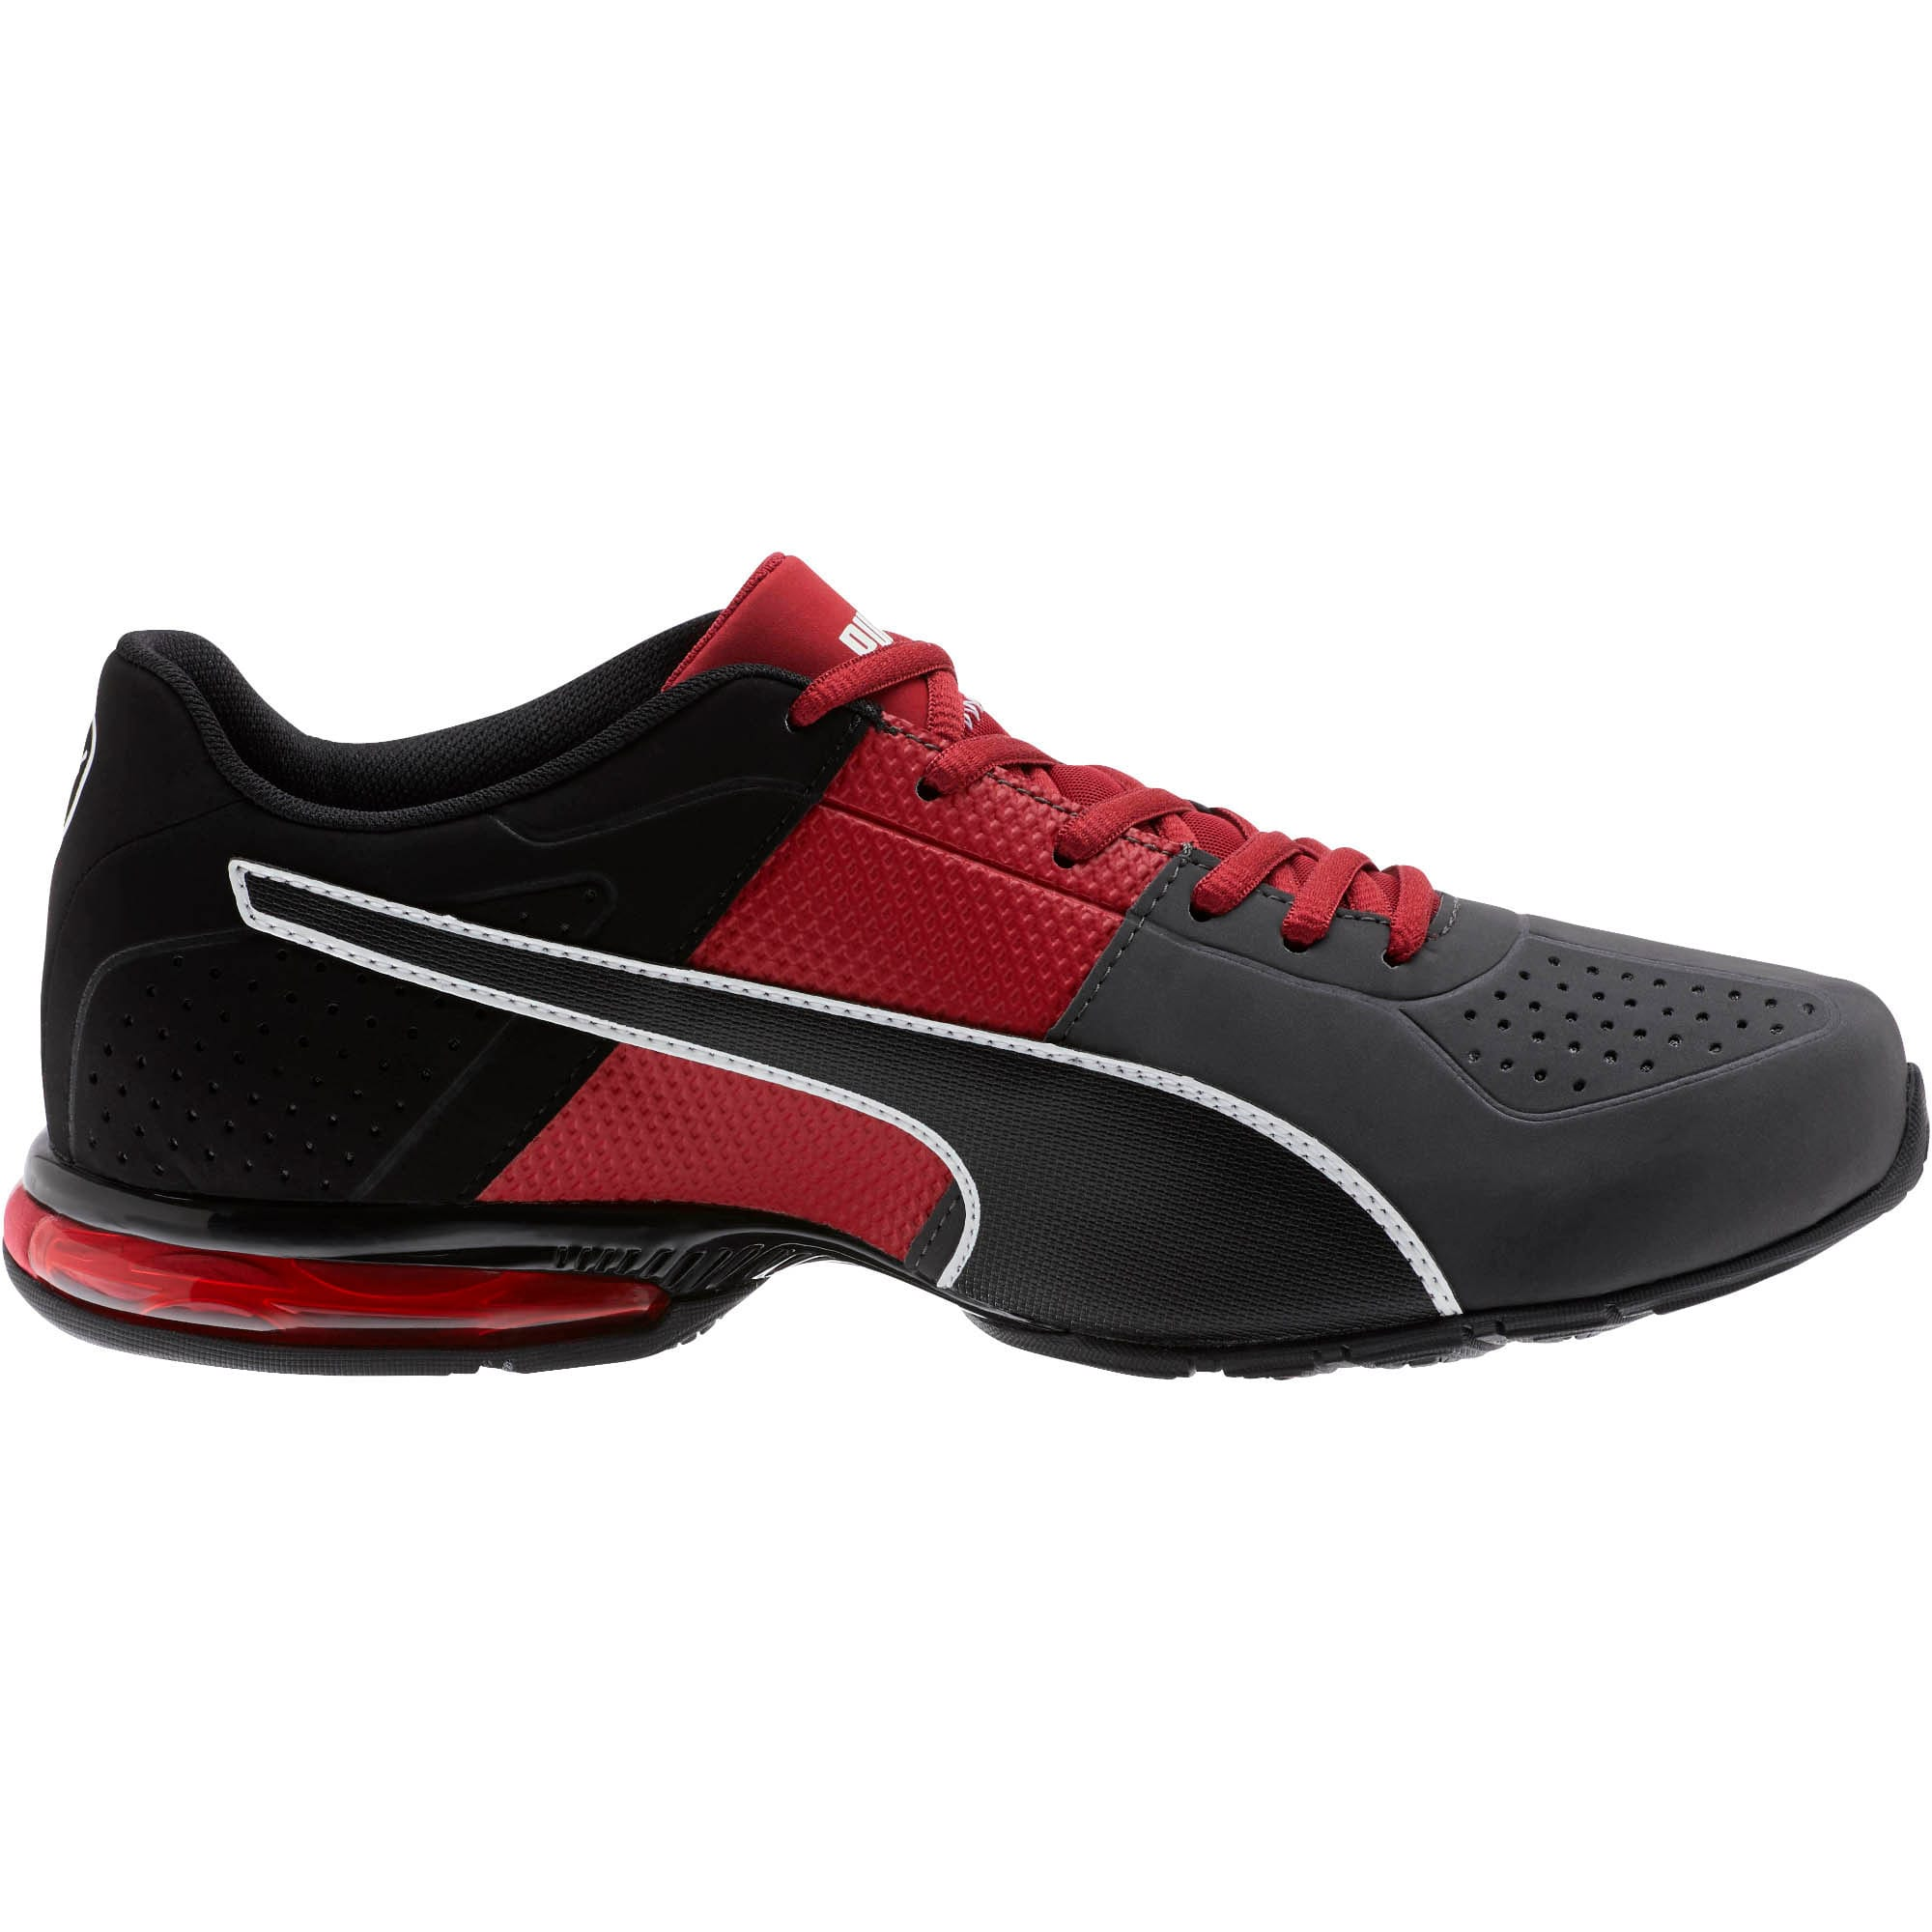 Thumbnail 4 of CELL Surin 2 Matte Men's Training Shoes, Rhubarb-Puma White, medium